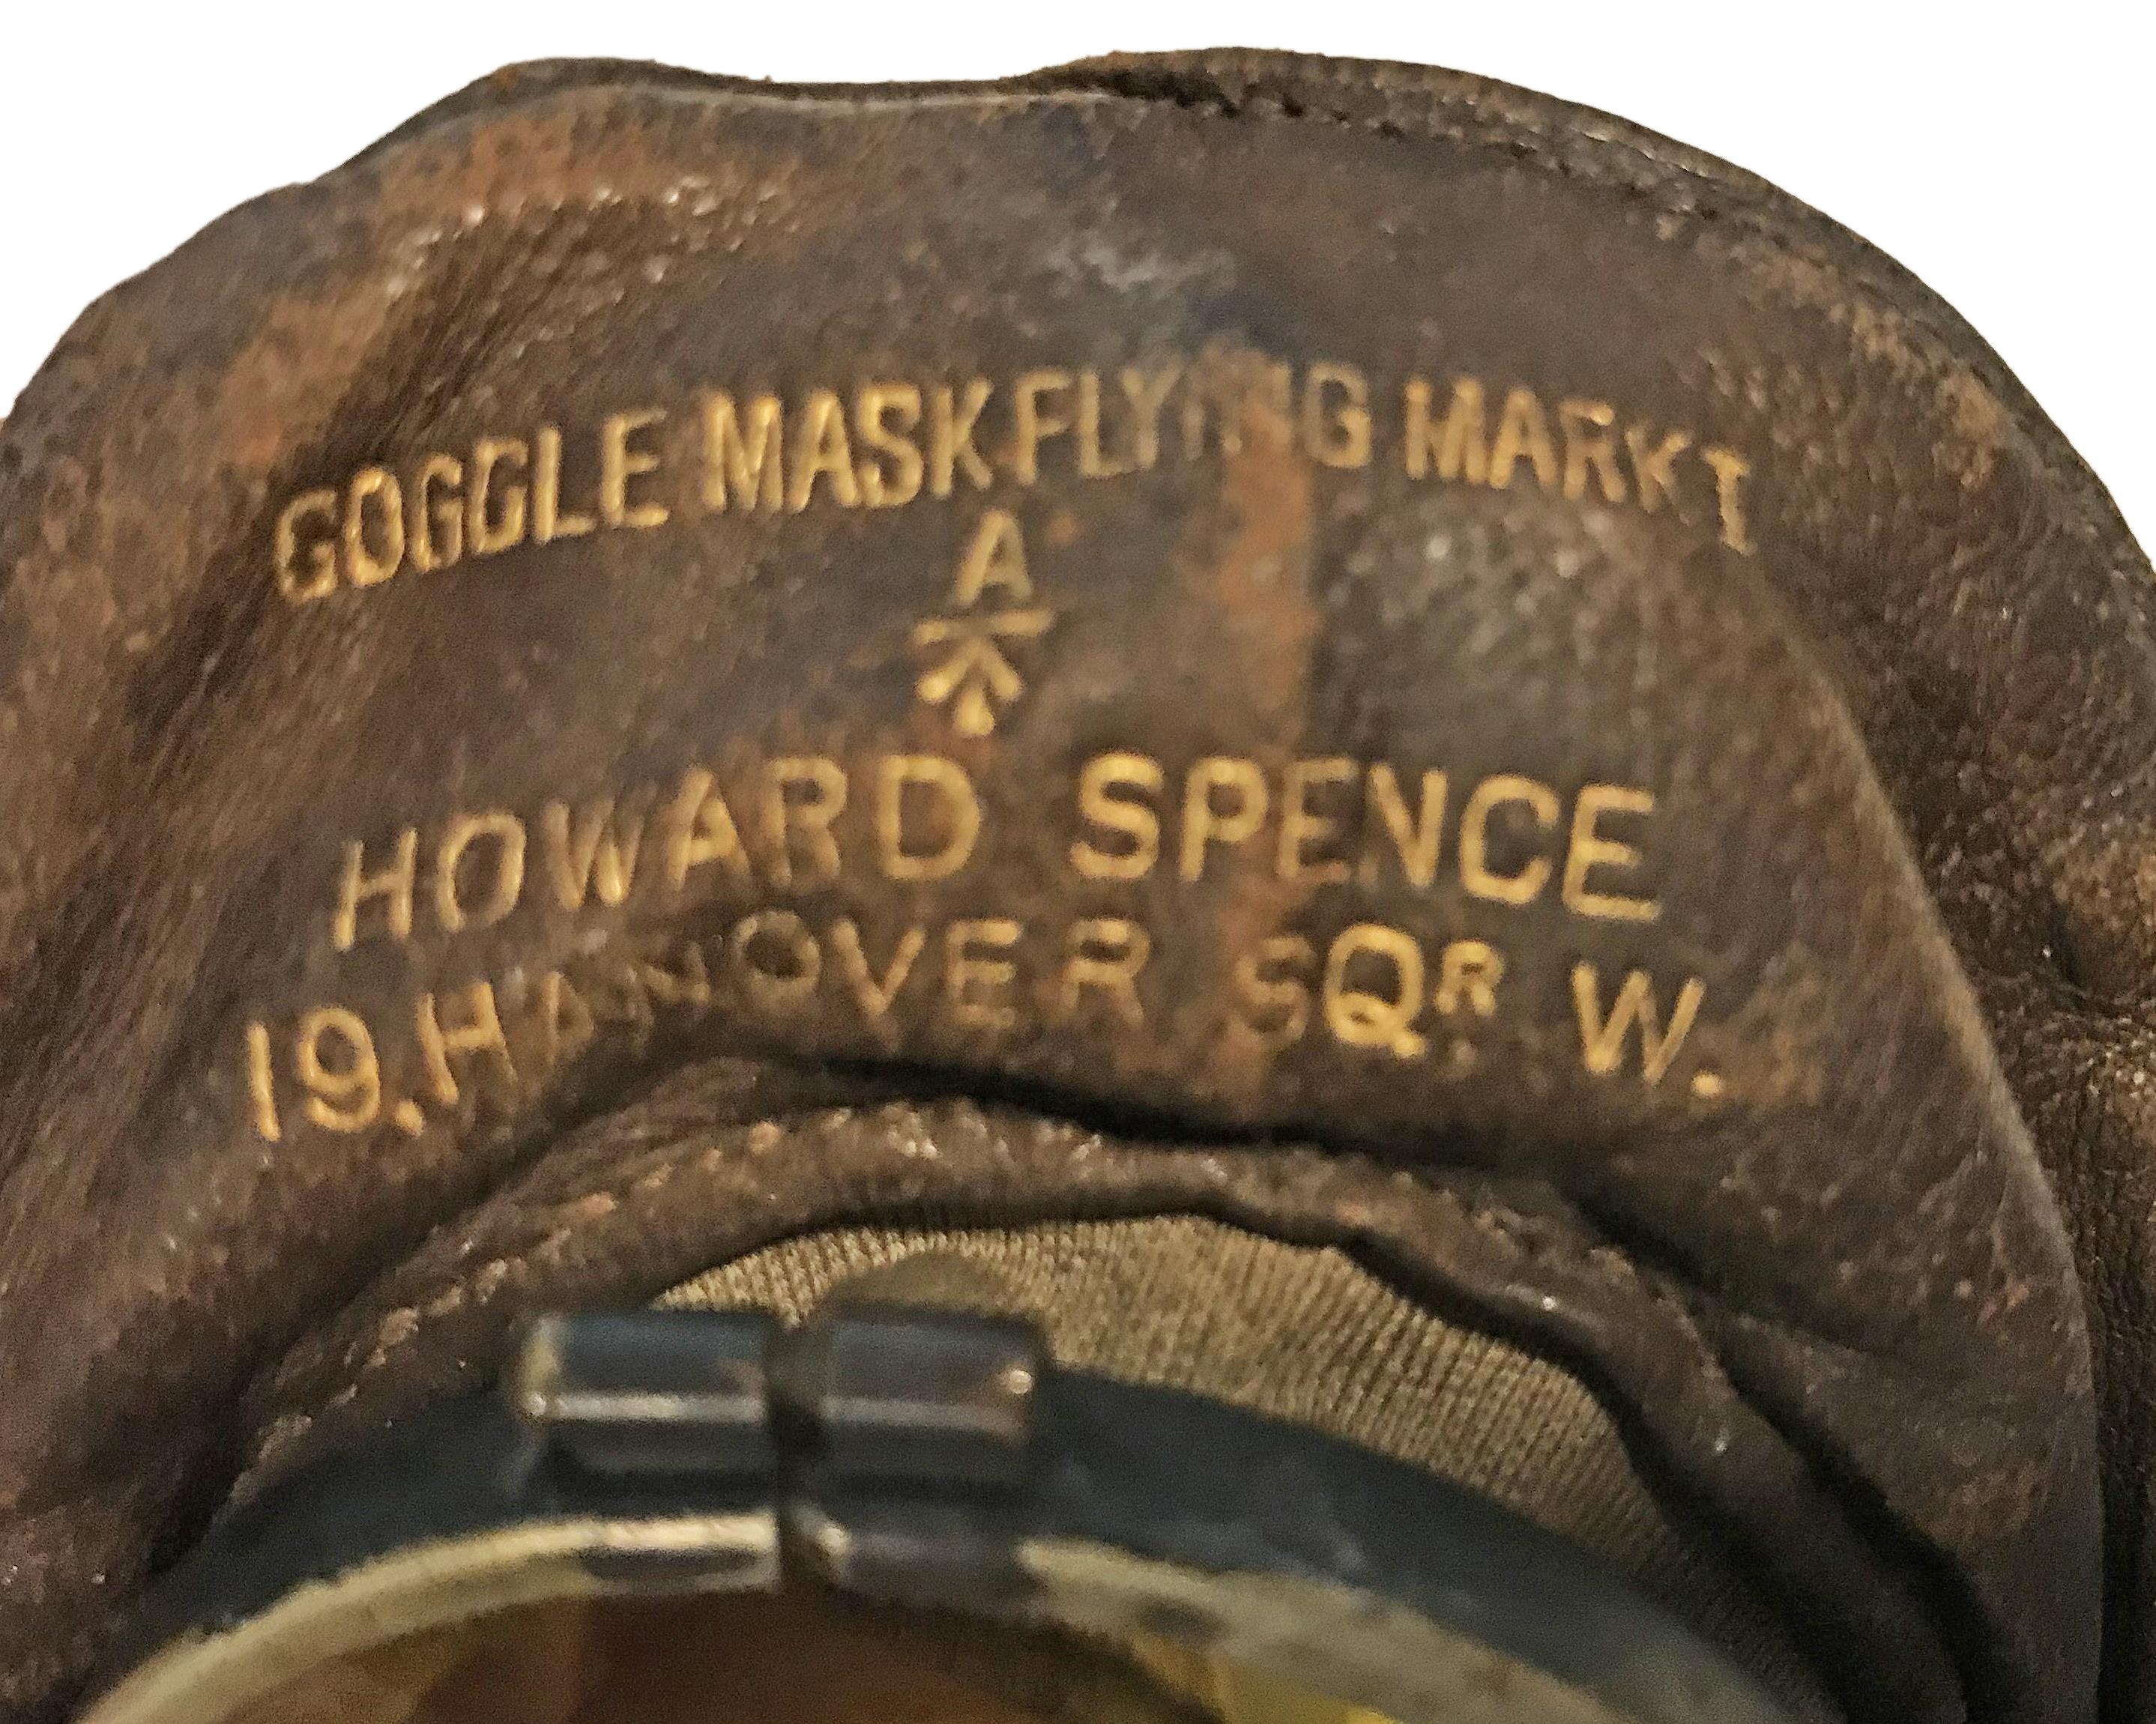 RFC Mk I Goggle Mask by Howard Spence